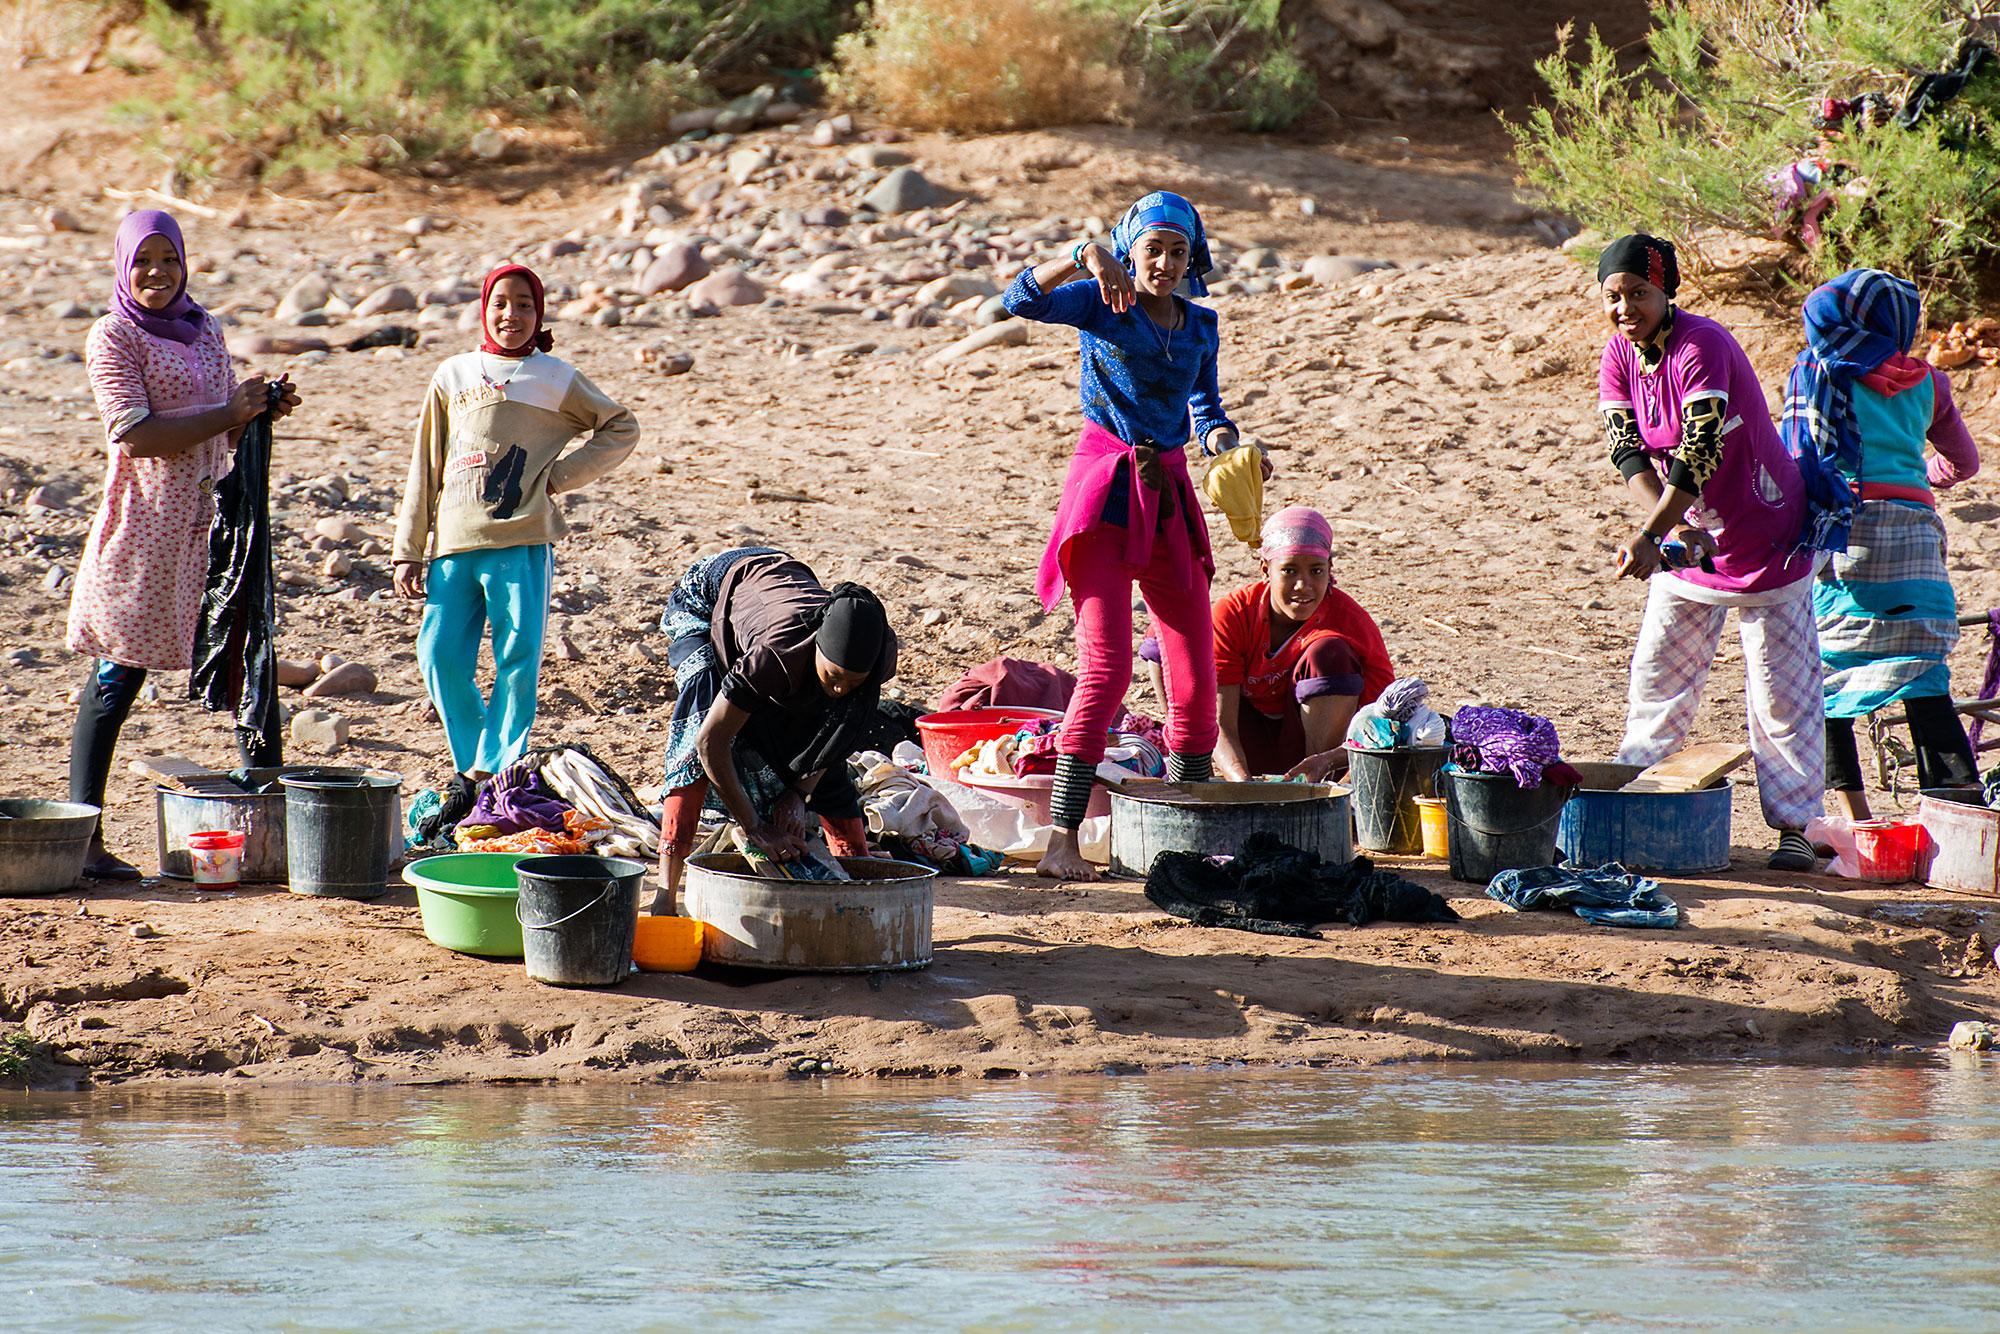 Berber Woman washing cloth in River Morocco